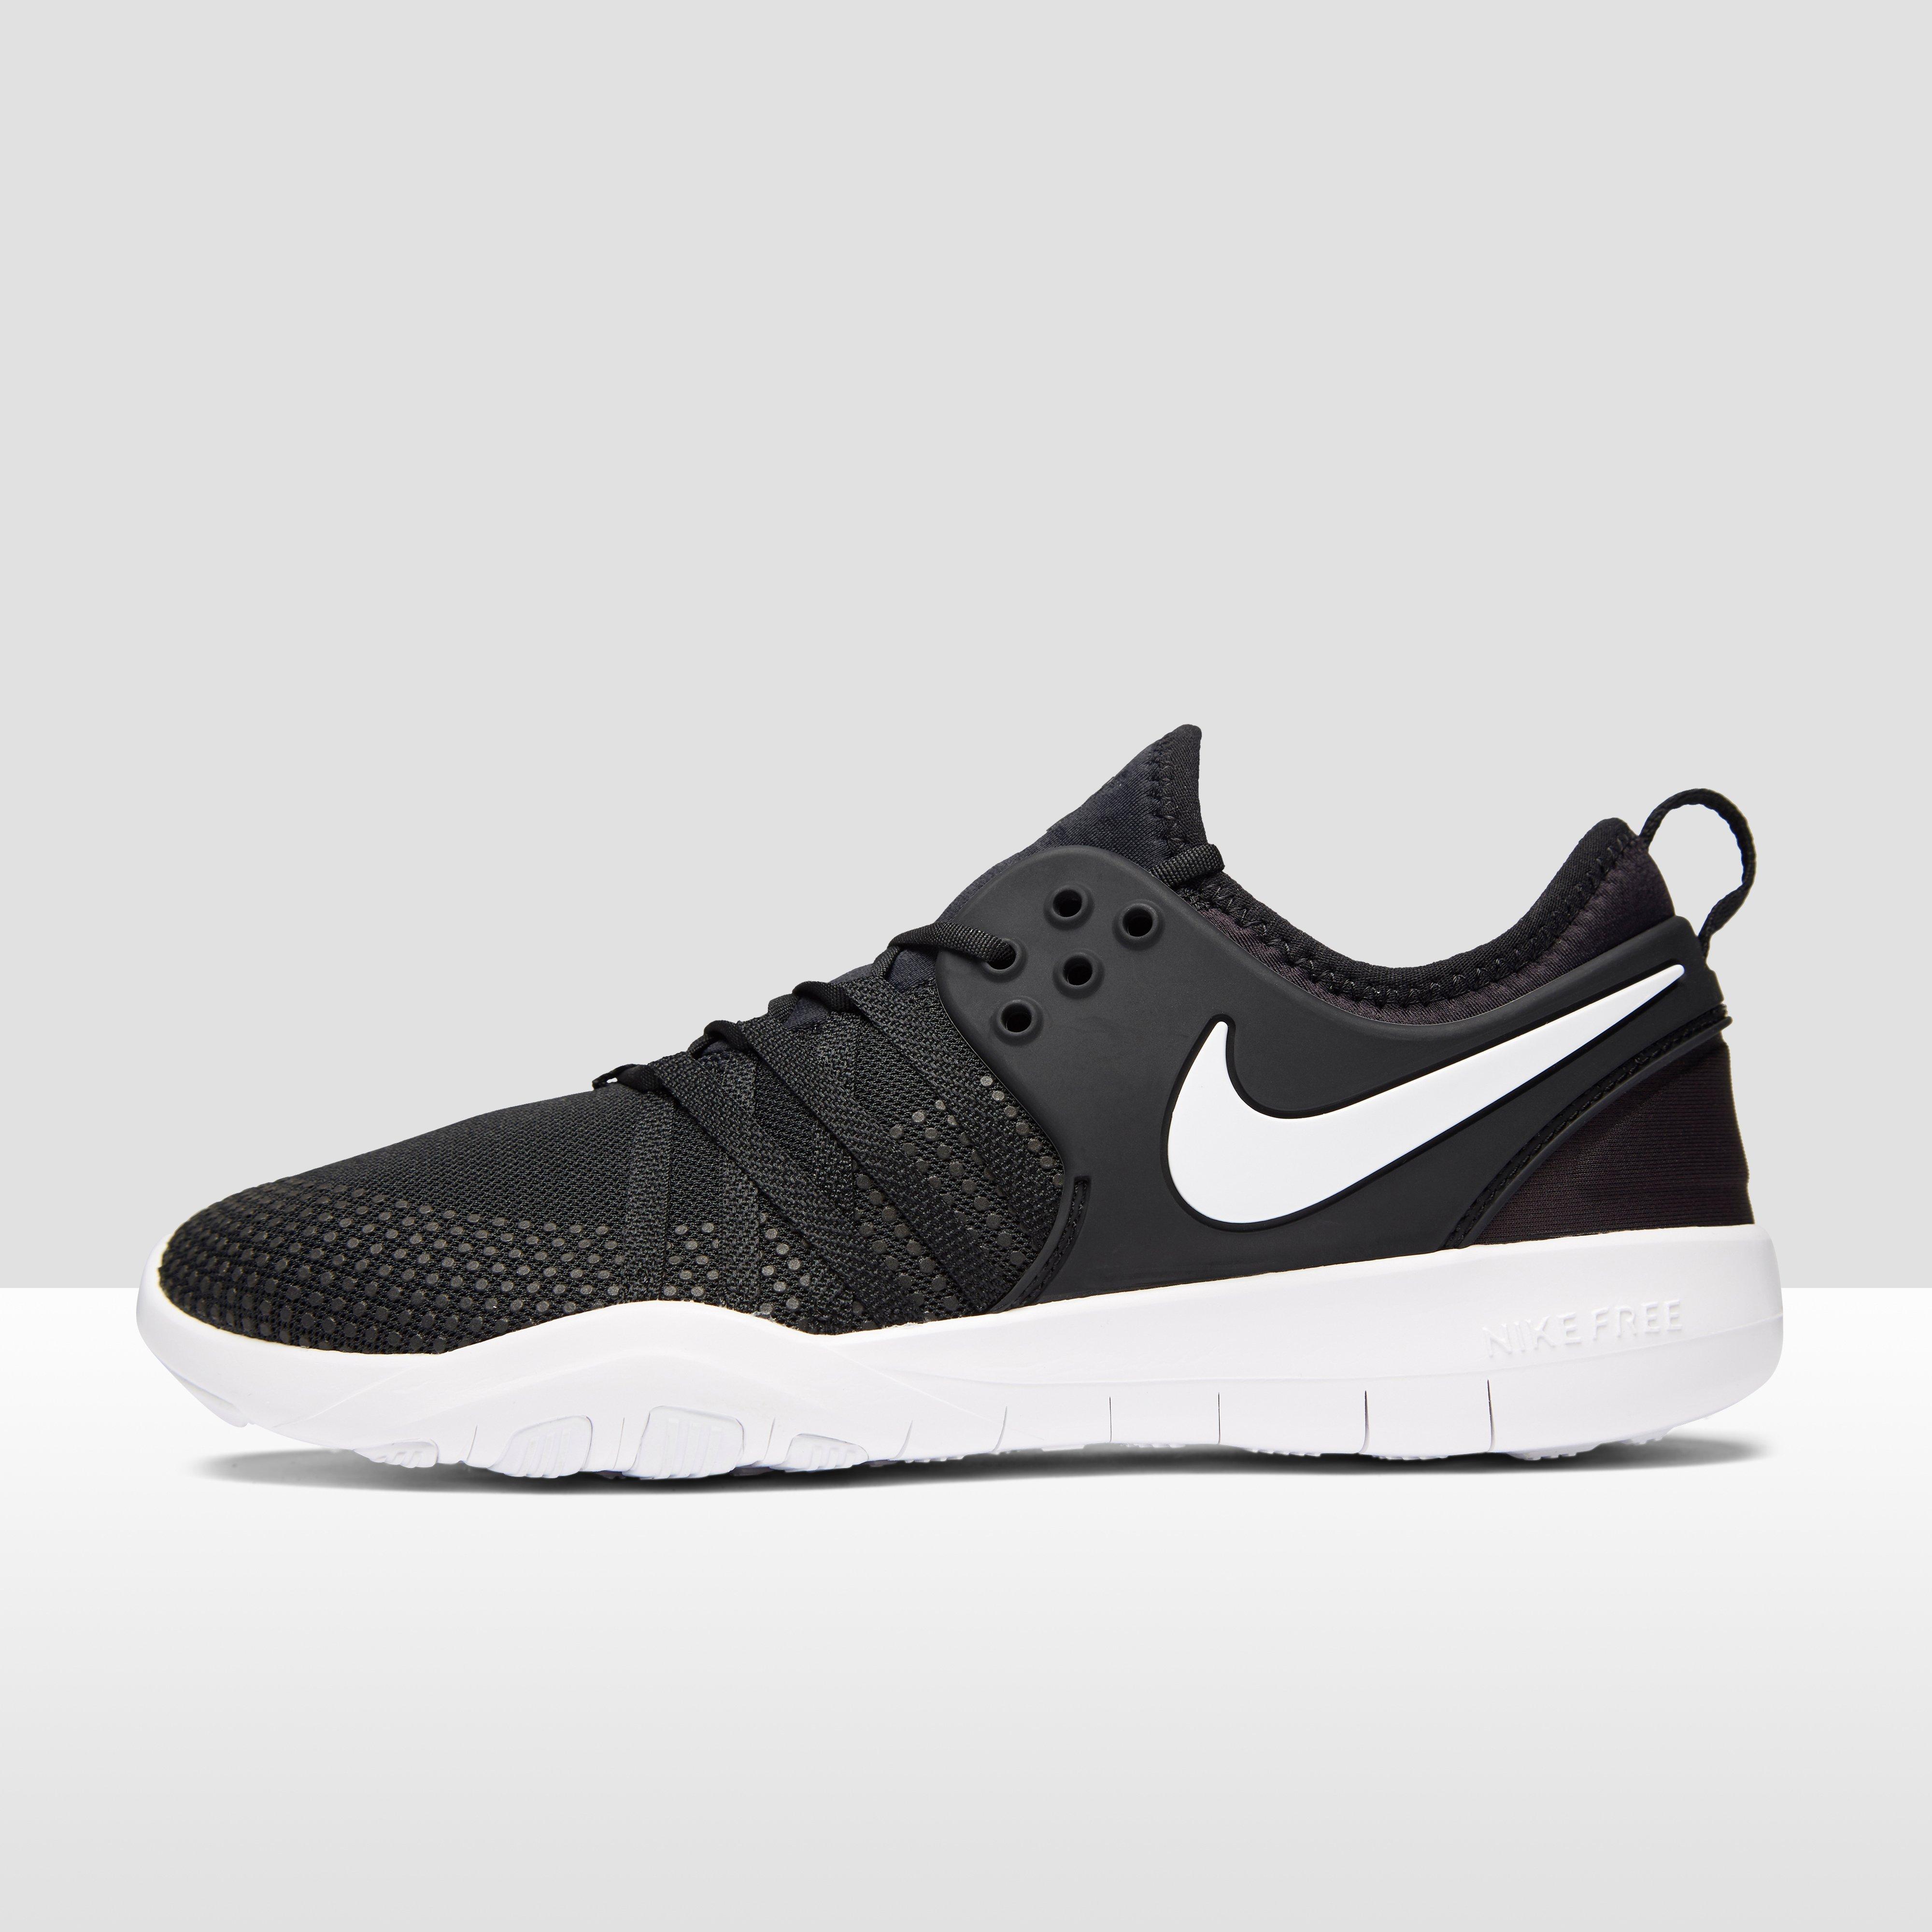 Nike - Free Tr 7 Chaussures De Fitness - Femmes - Chaussures - Noir - 40 IJFhg